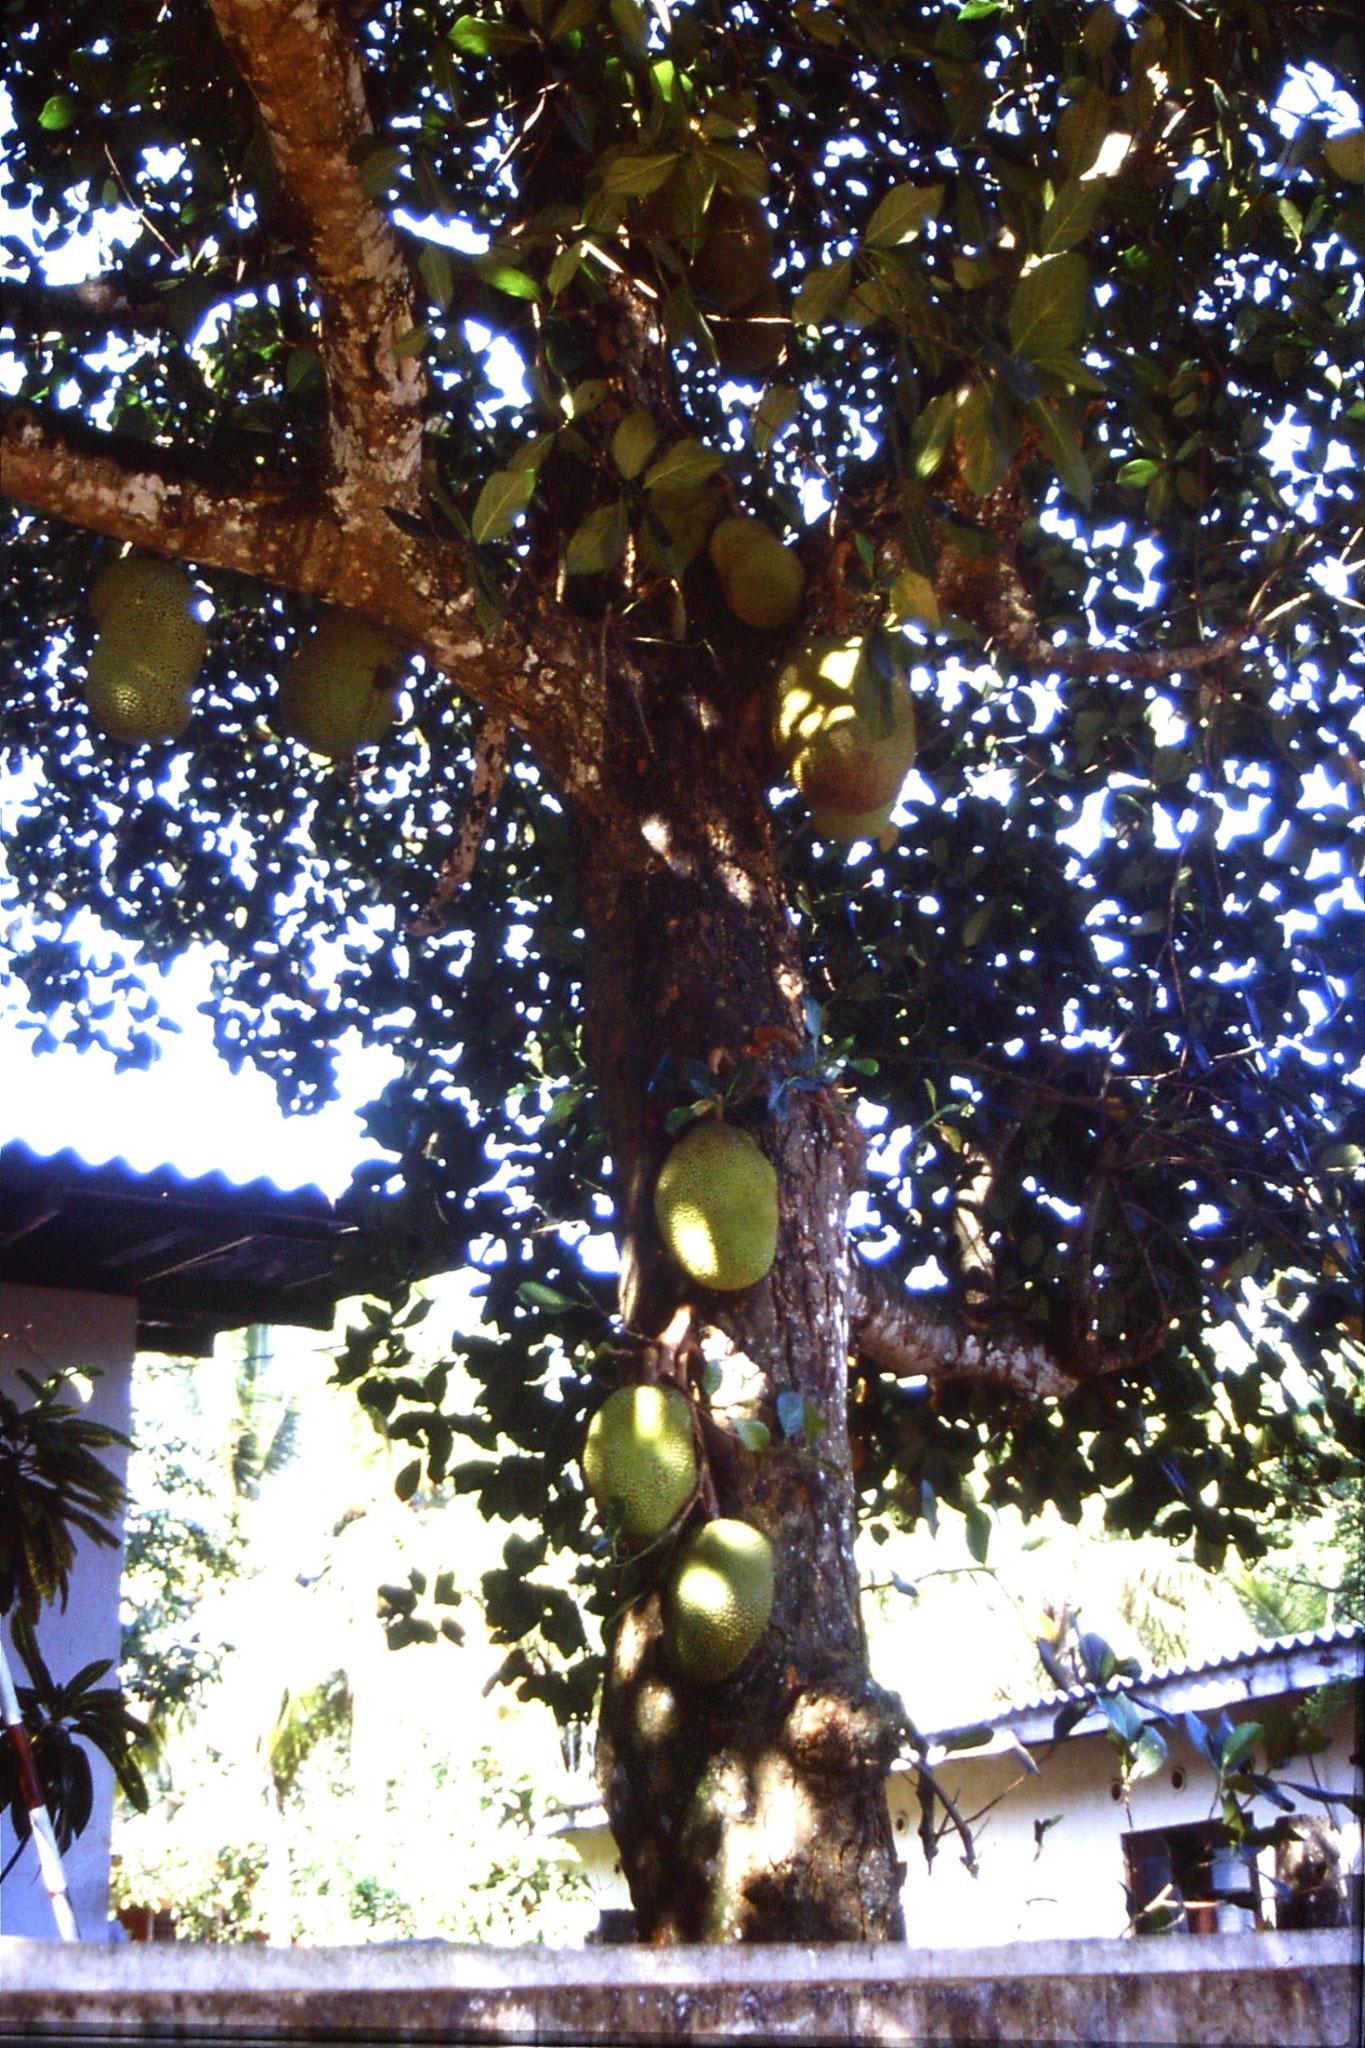 24/1/1990: 28: Pilyandala, jack fruit